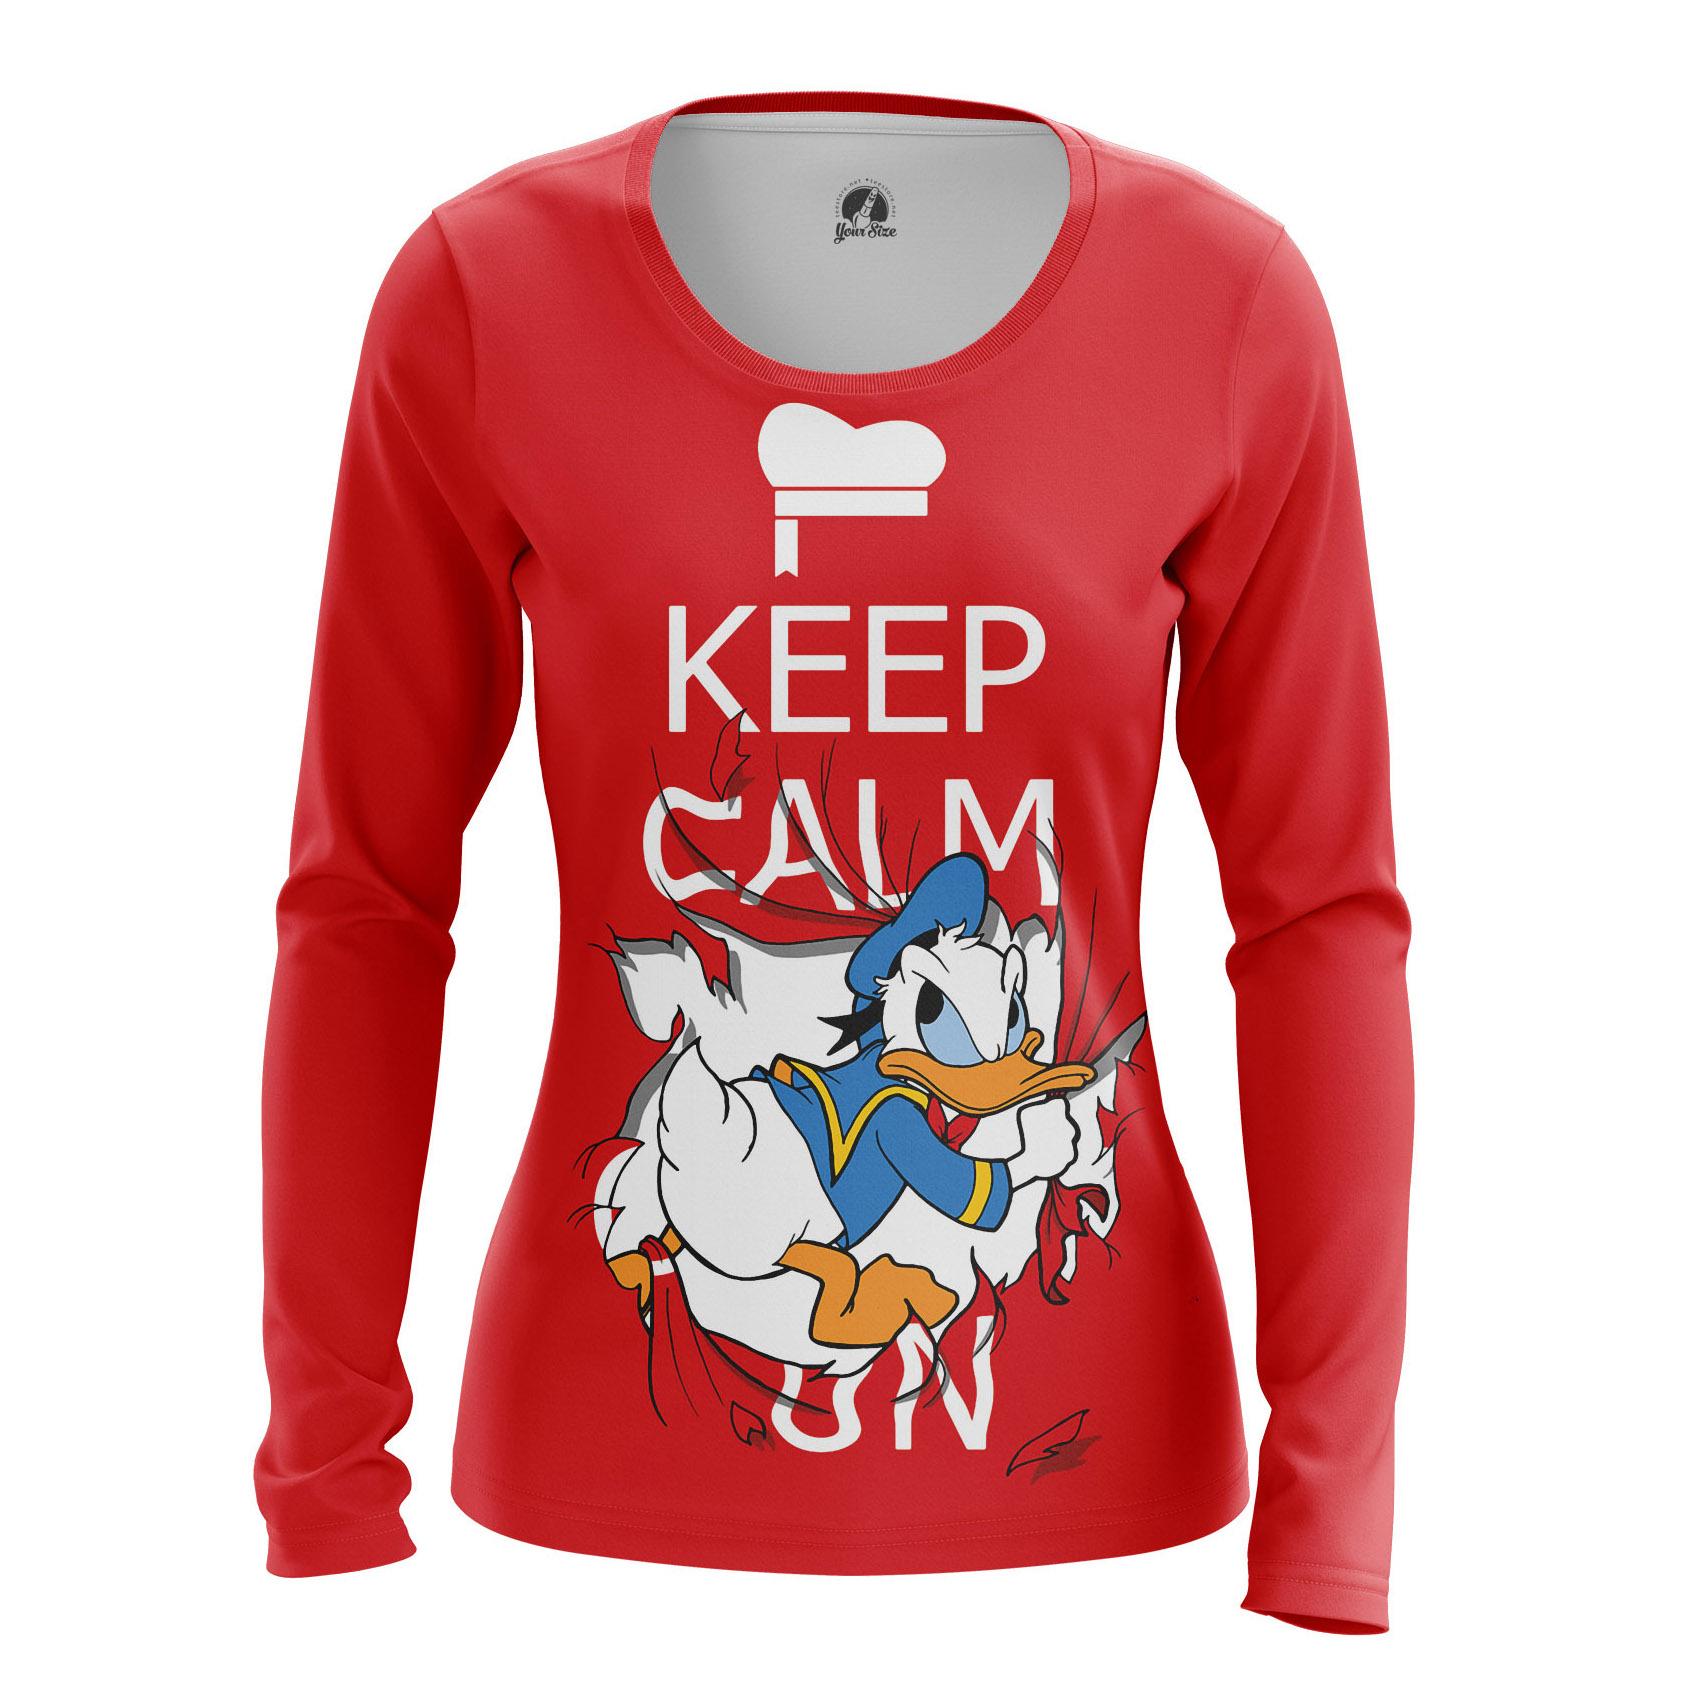 Collectibles Women'S Long Sleeve Keep Calm Donald Duck